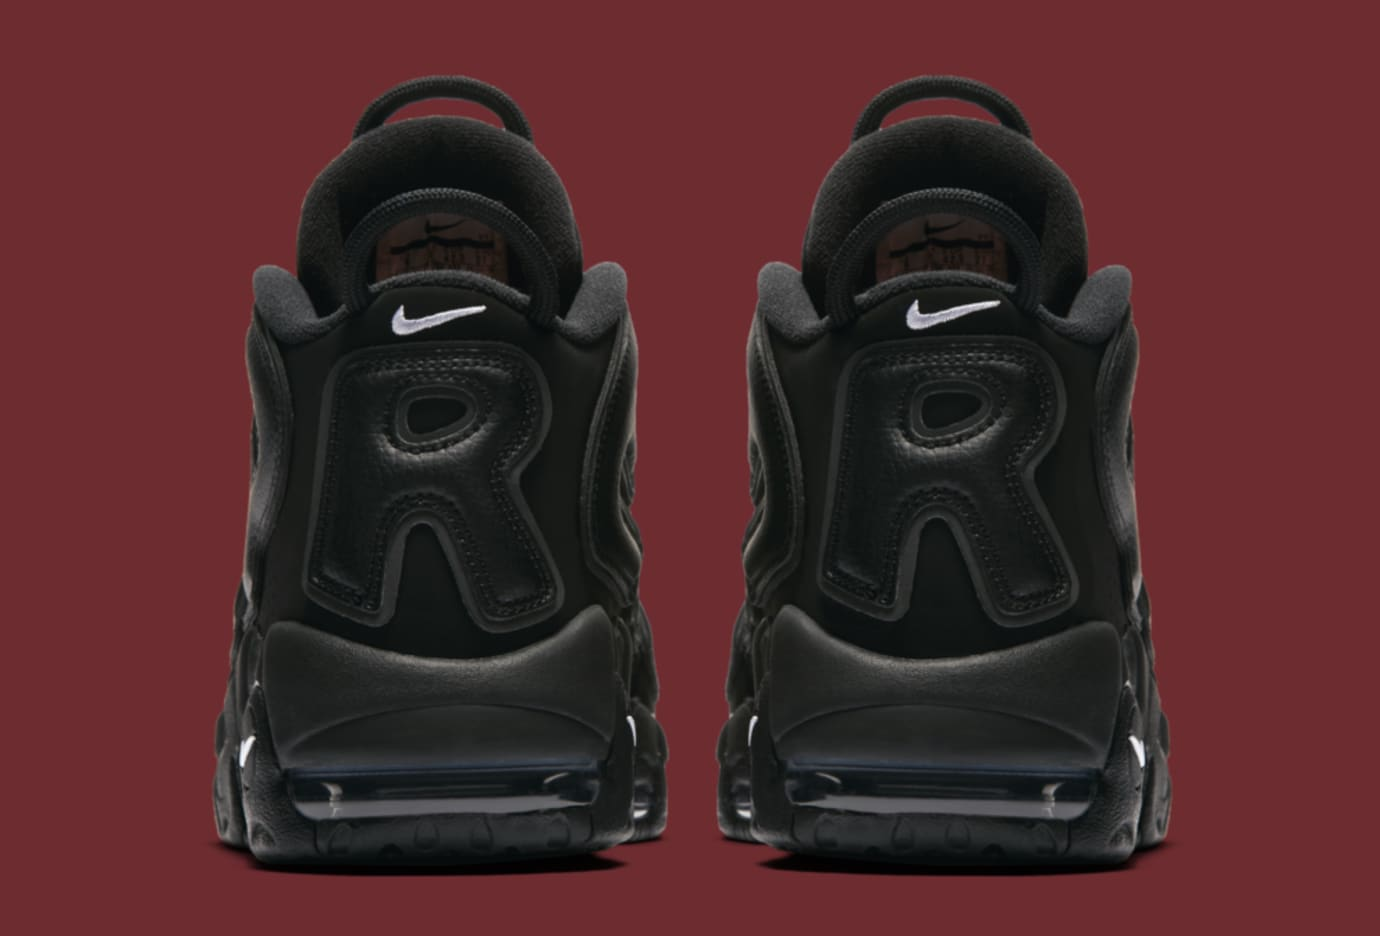 Black Supreme Nike Air More Uptempo 902290-001 Heel